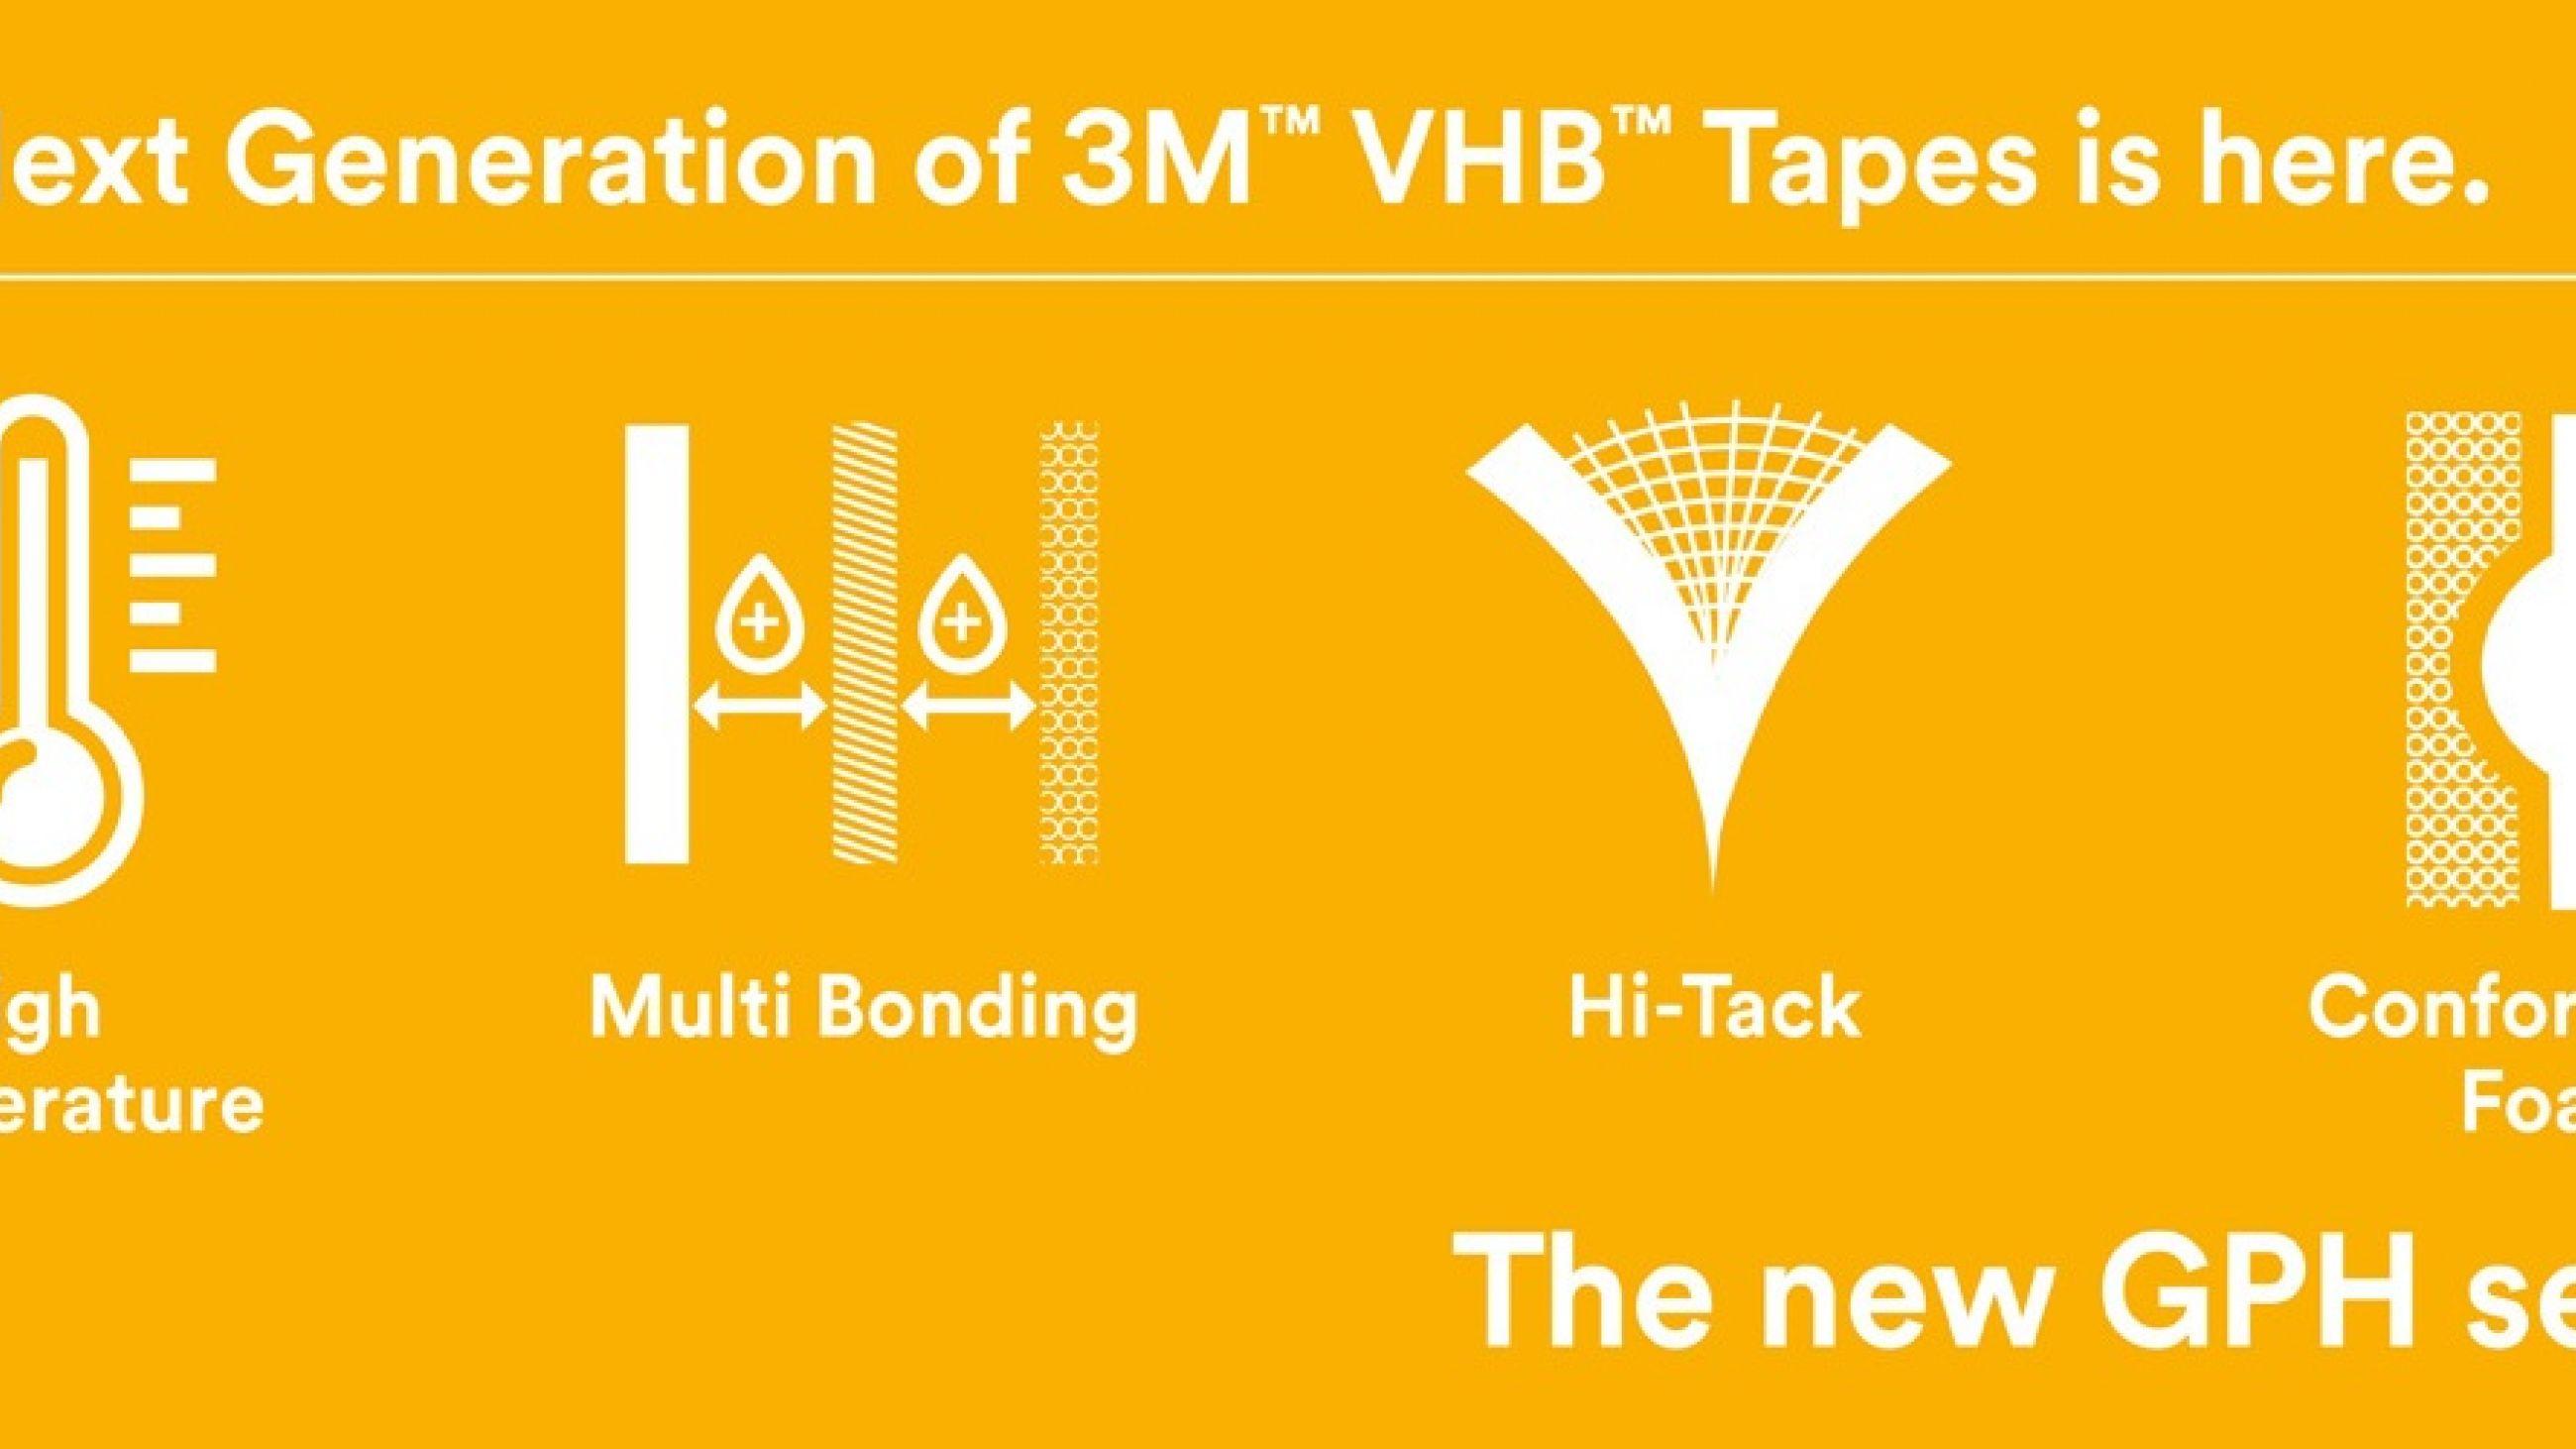 The new 3M VHB GPH series